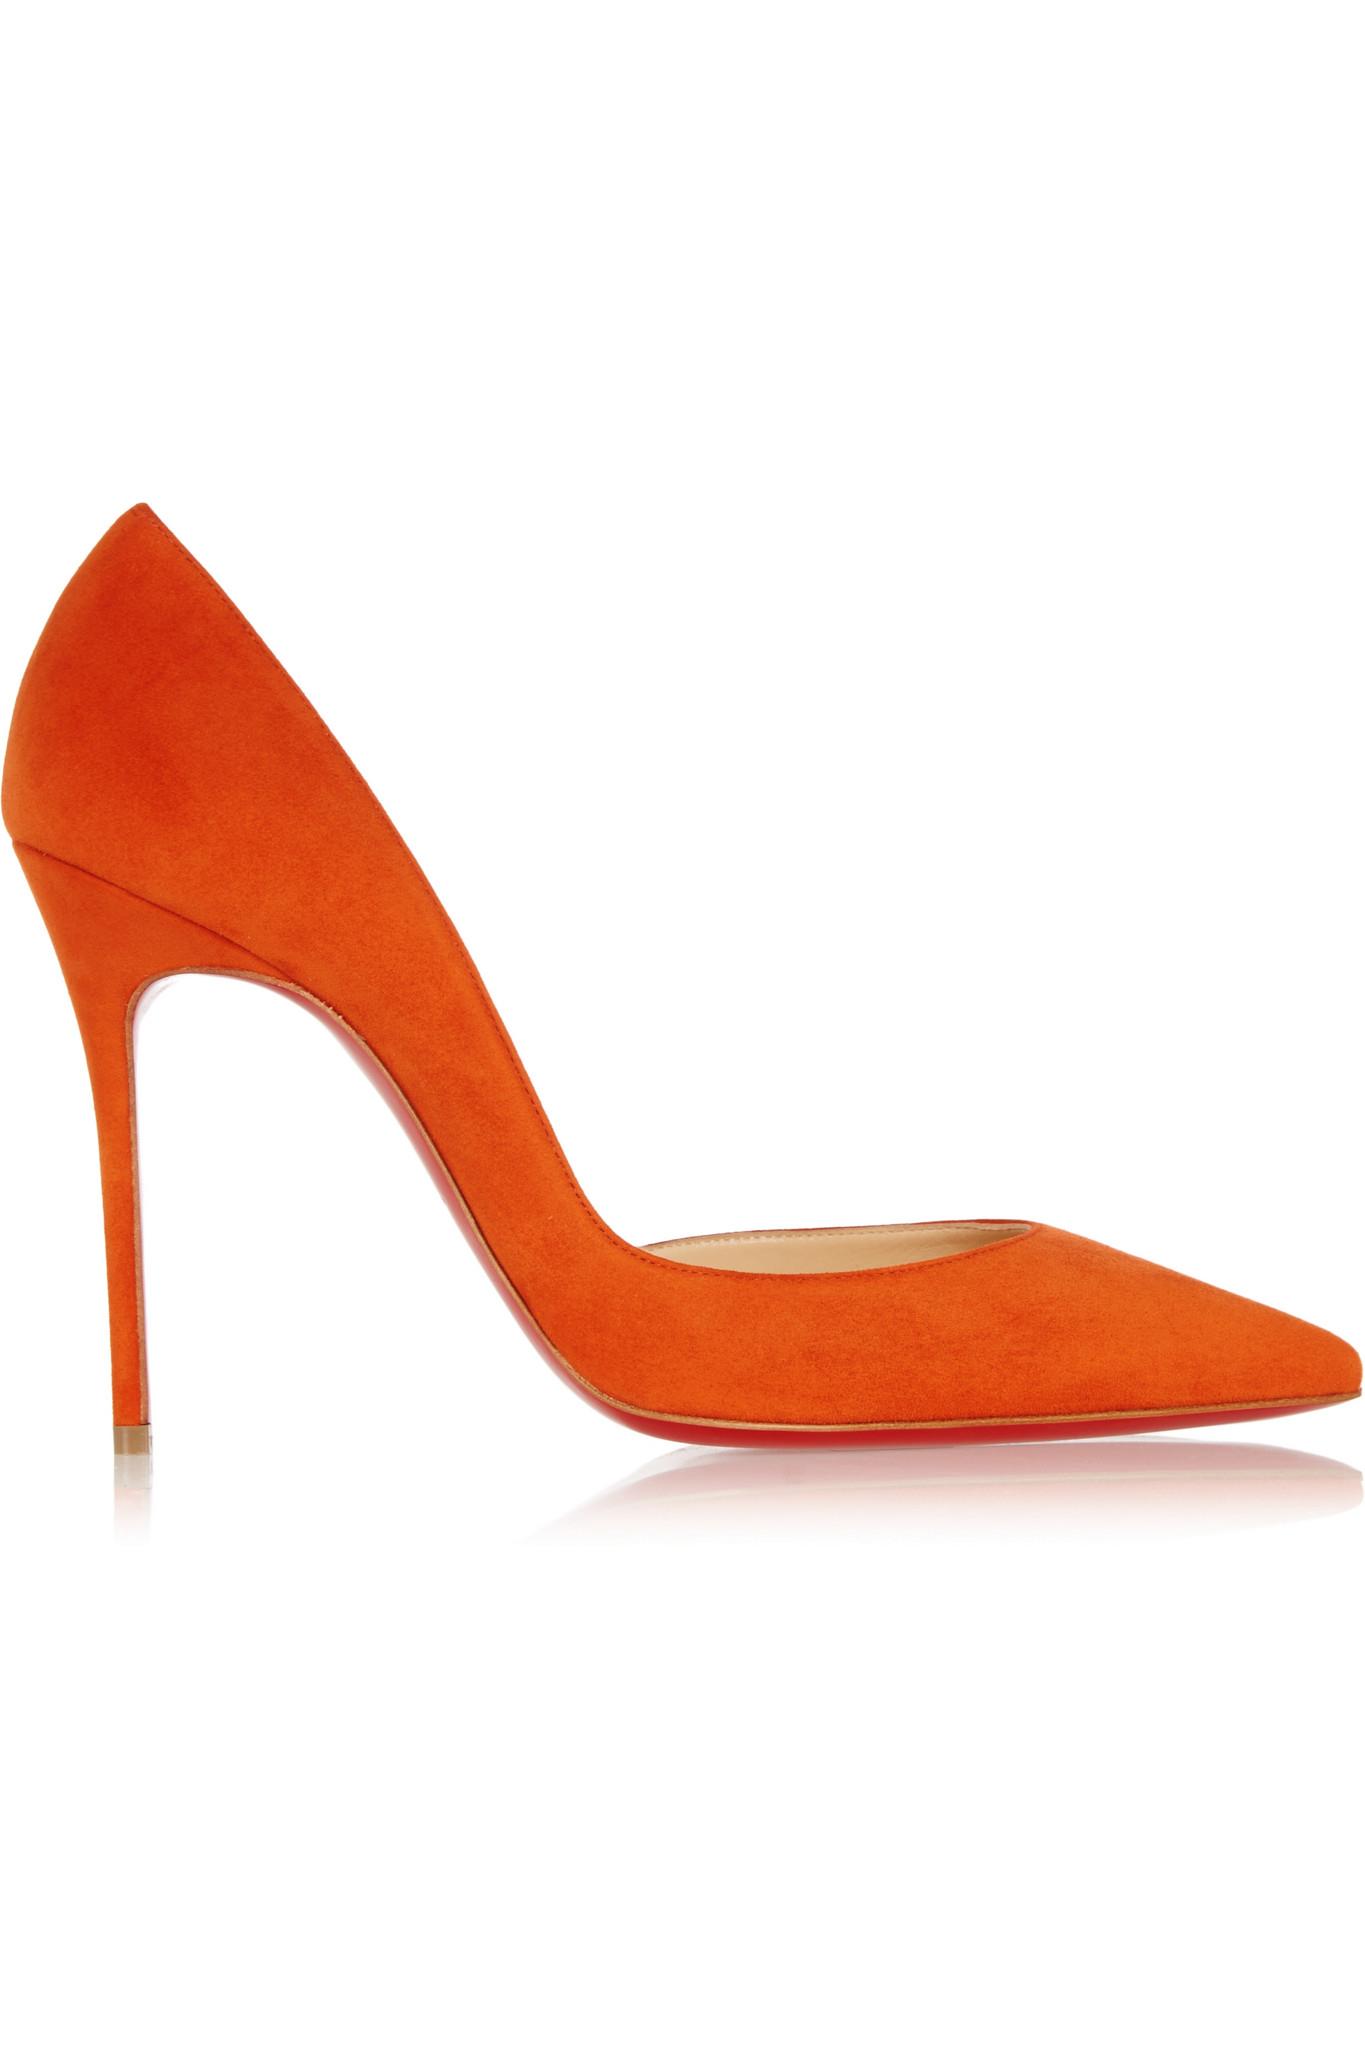 cheap knock off shoes - christian louboutin metallic iriza pumps w tags, best christian ...